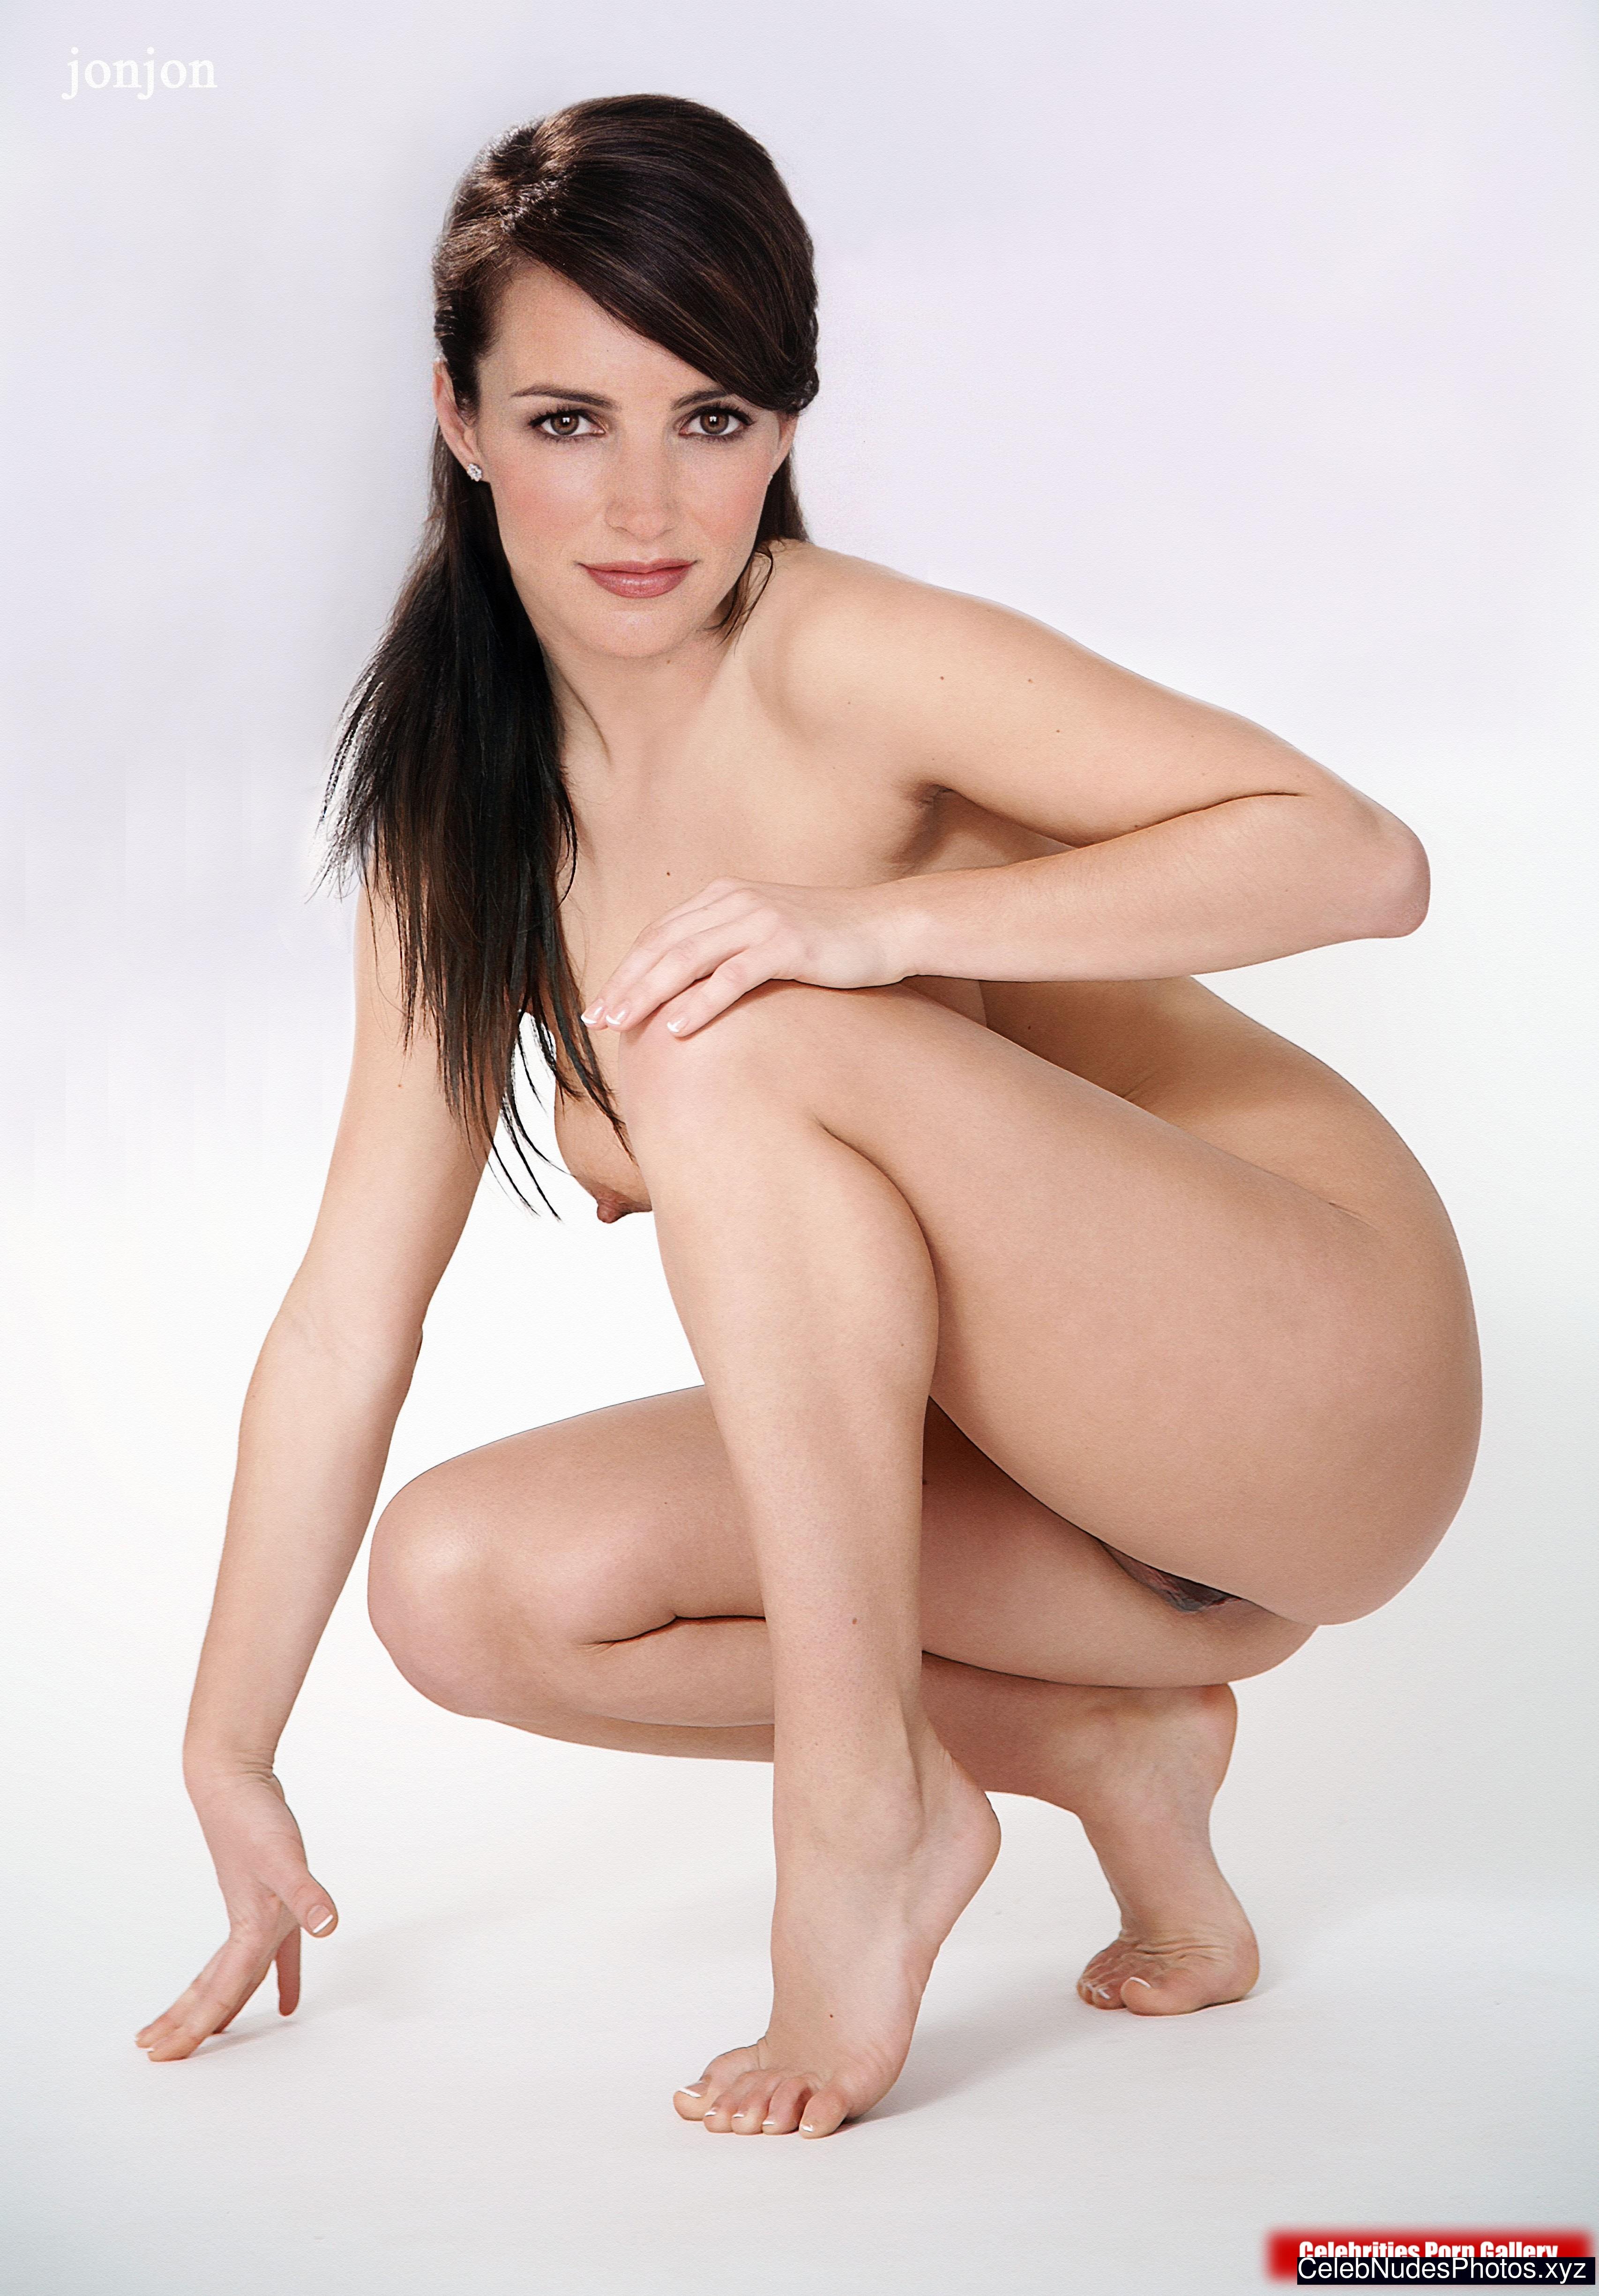 Porn pic of jacqueline bracamontes cartoons